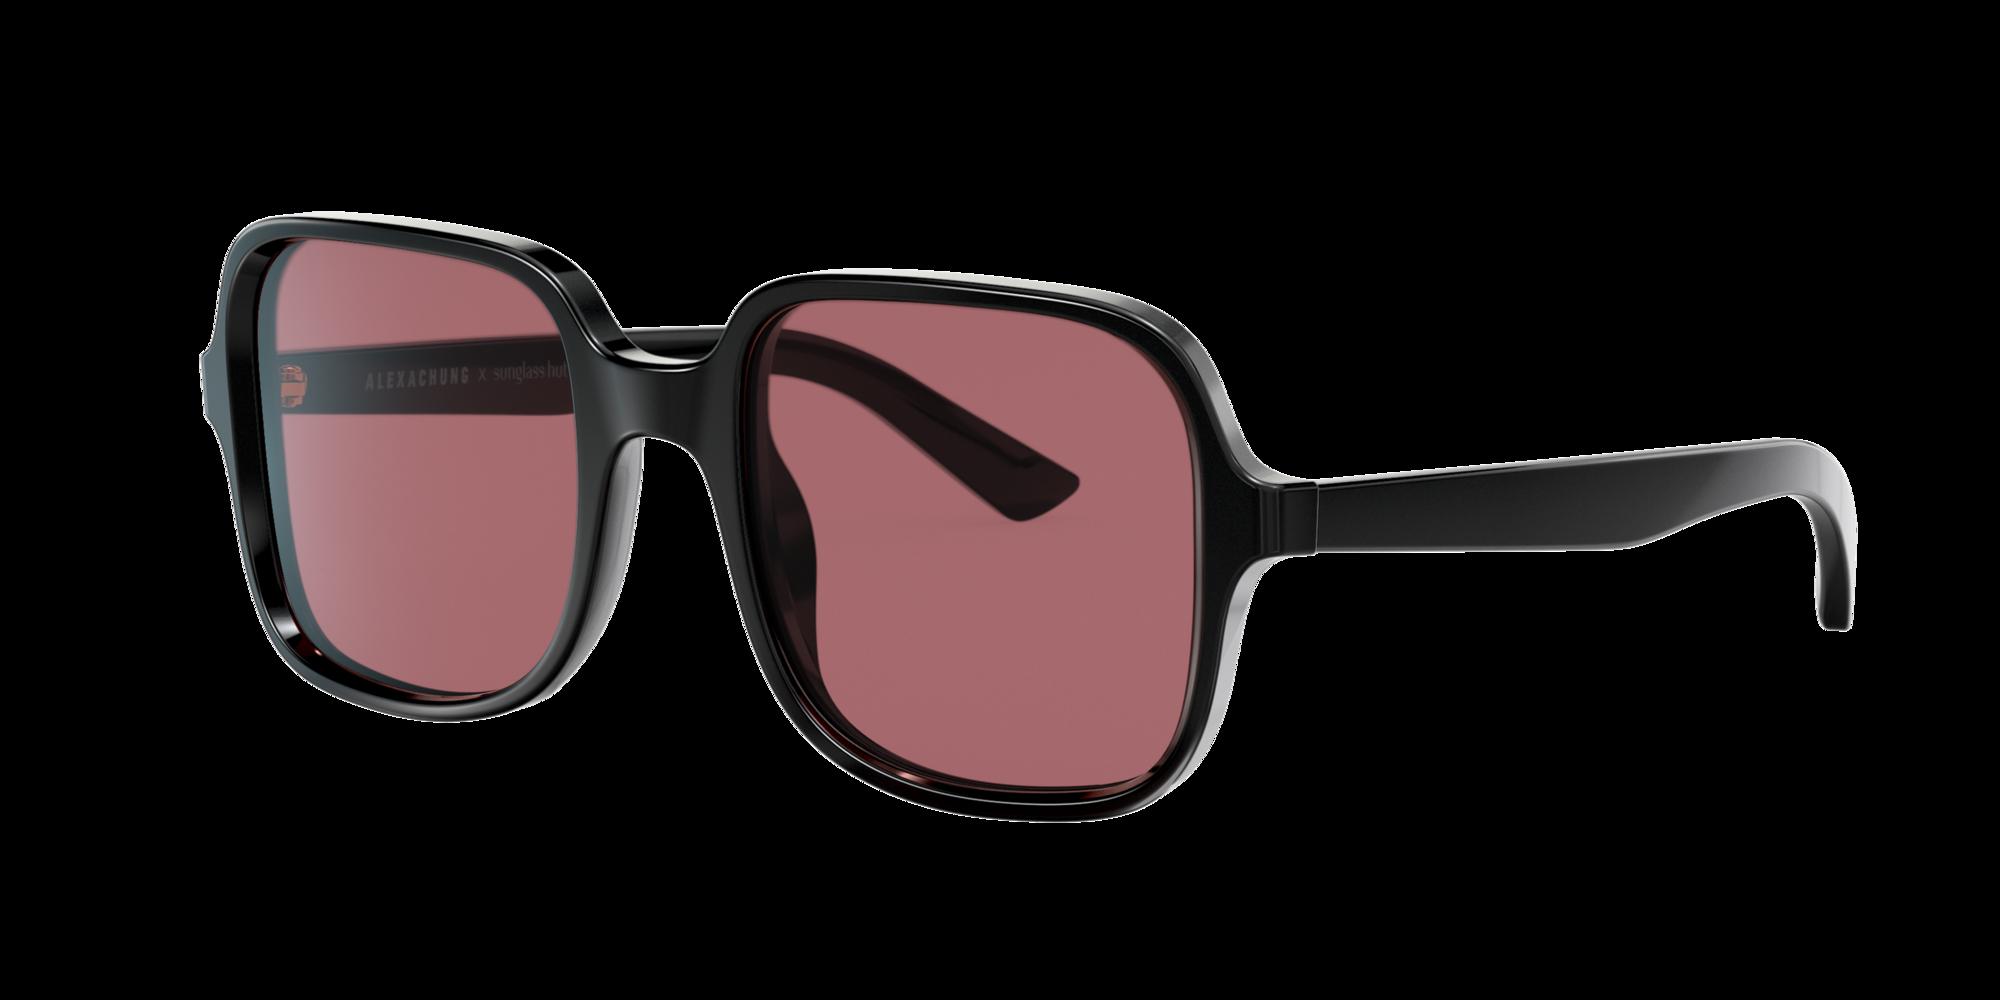 Coleccion Sunglass Hut Unisex  HU4005 -  Frame color: Negro, Lens color: Violeta, Size 54-21/140